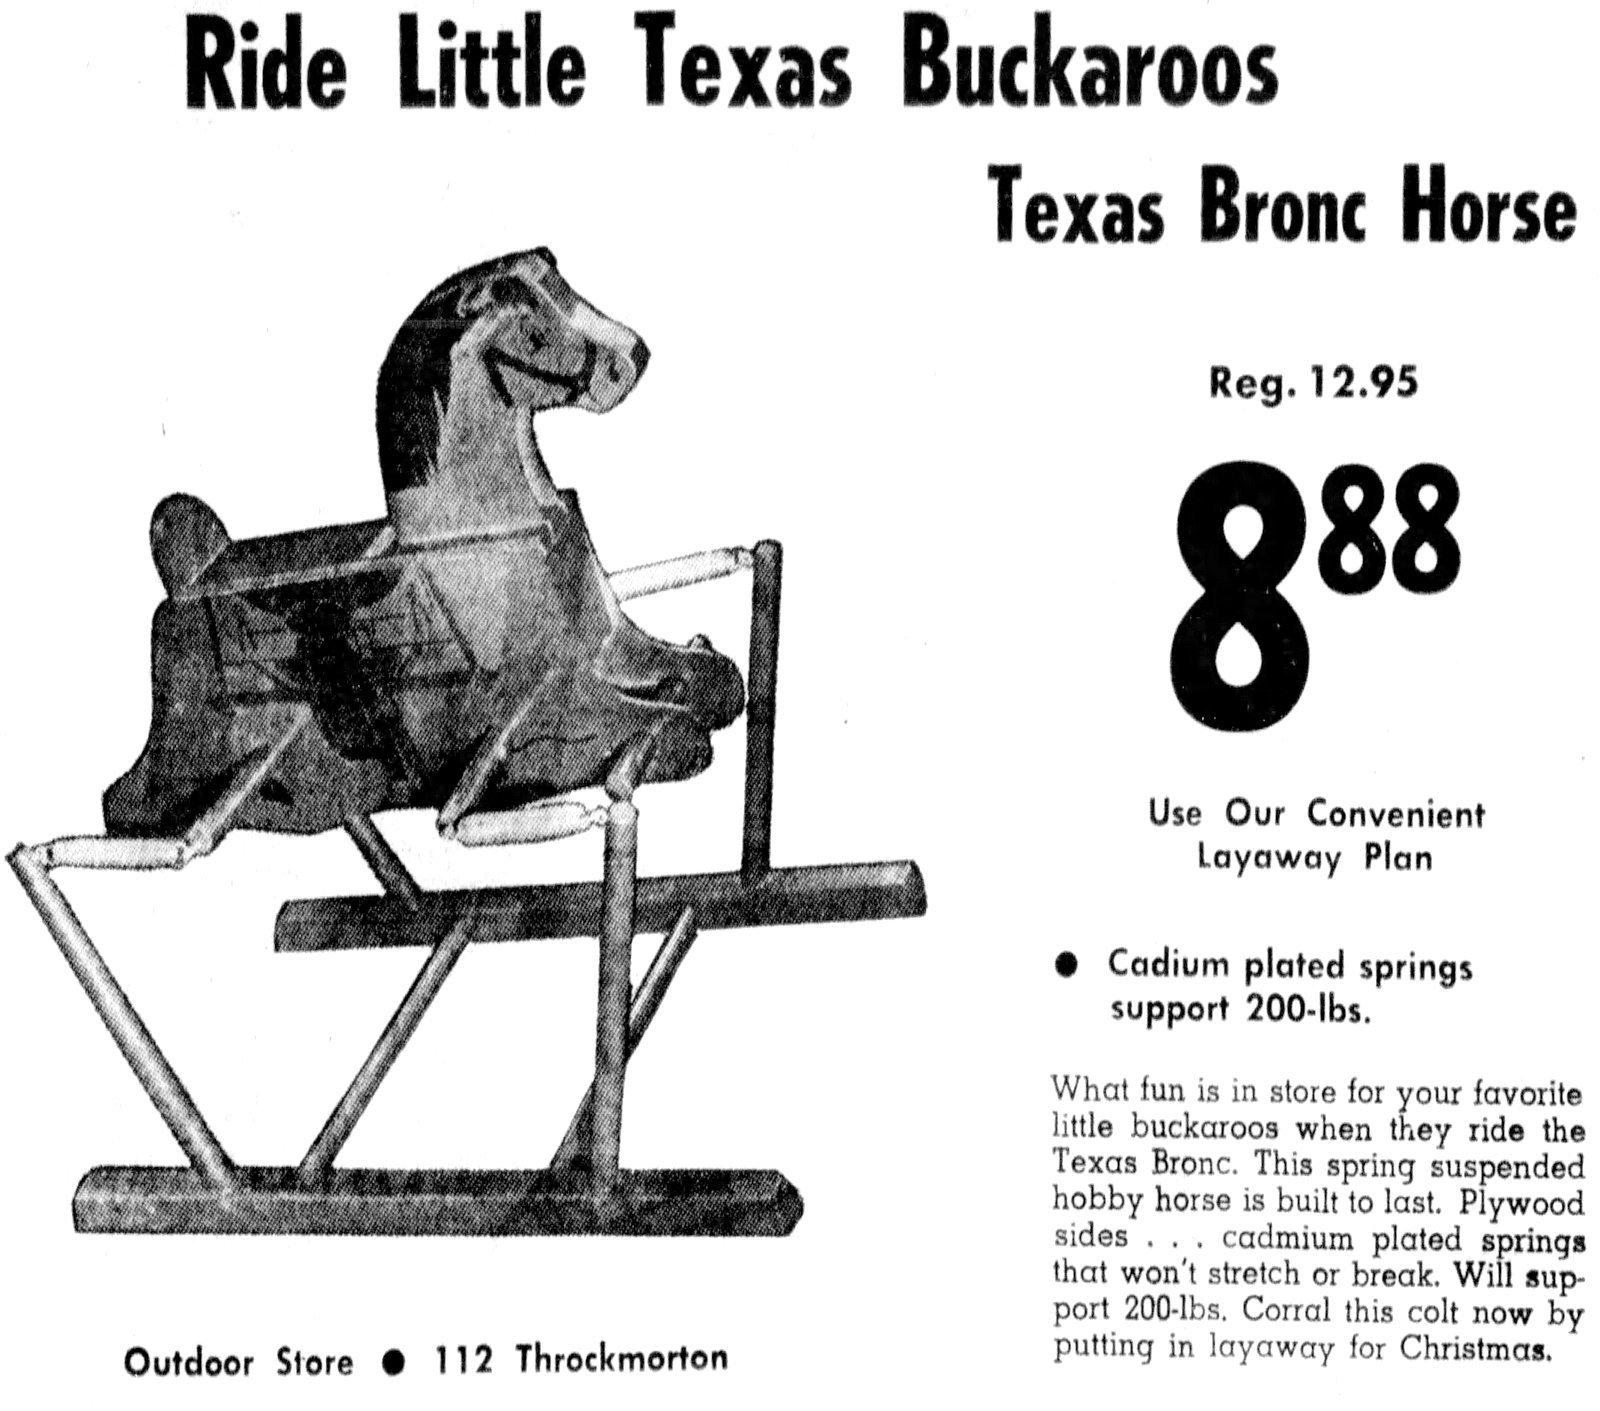 Little Texas Buckaroos - Texas bronc horse ride-on toy (1959)